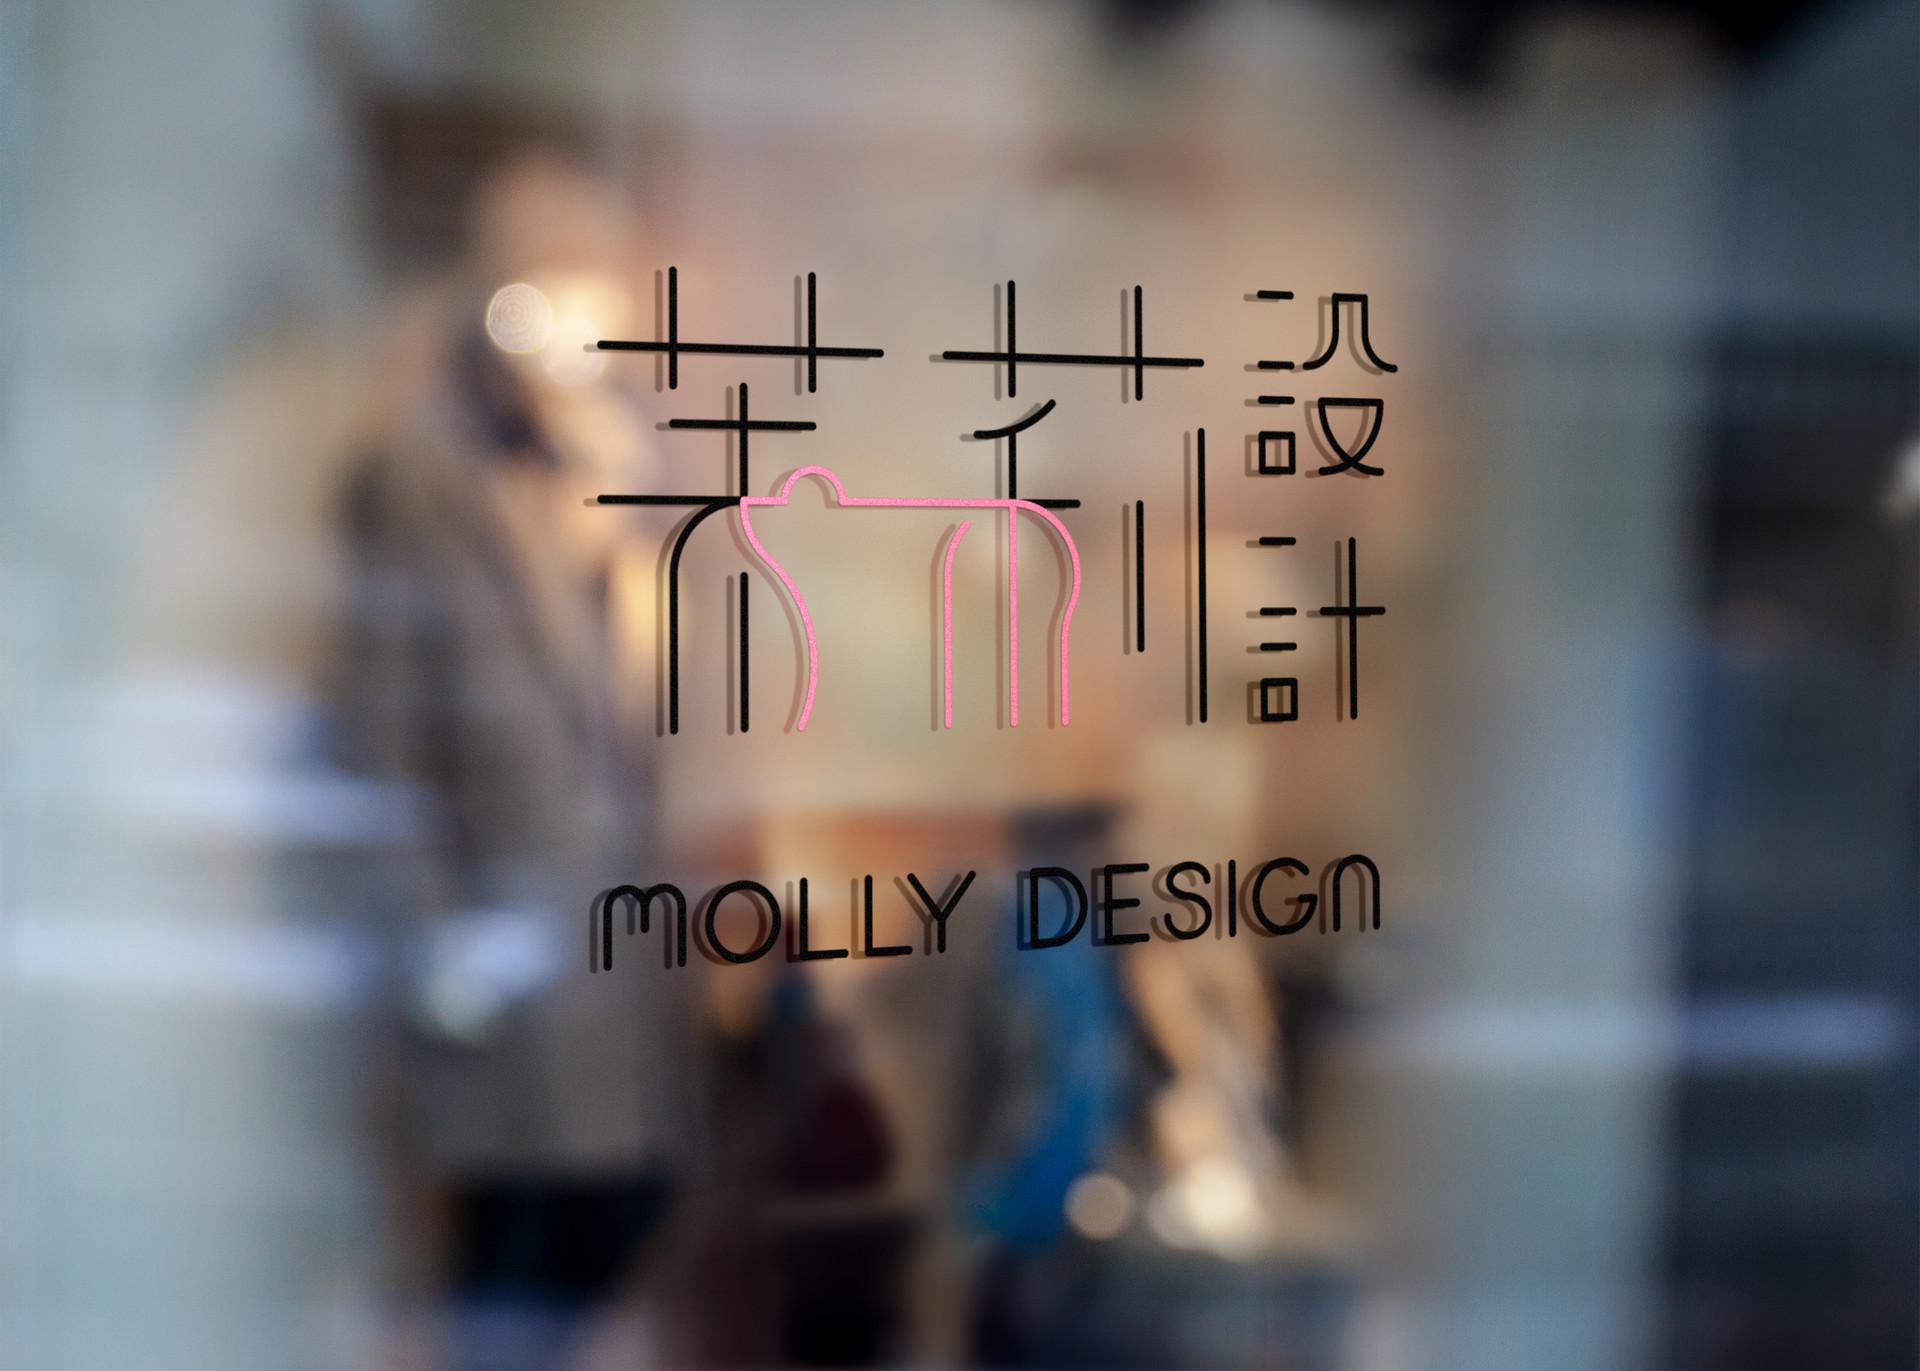 molly design.jpg